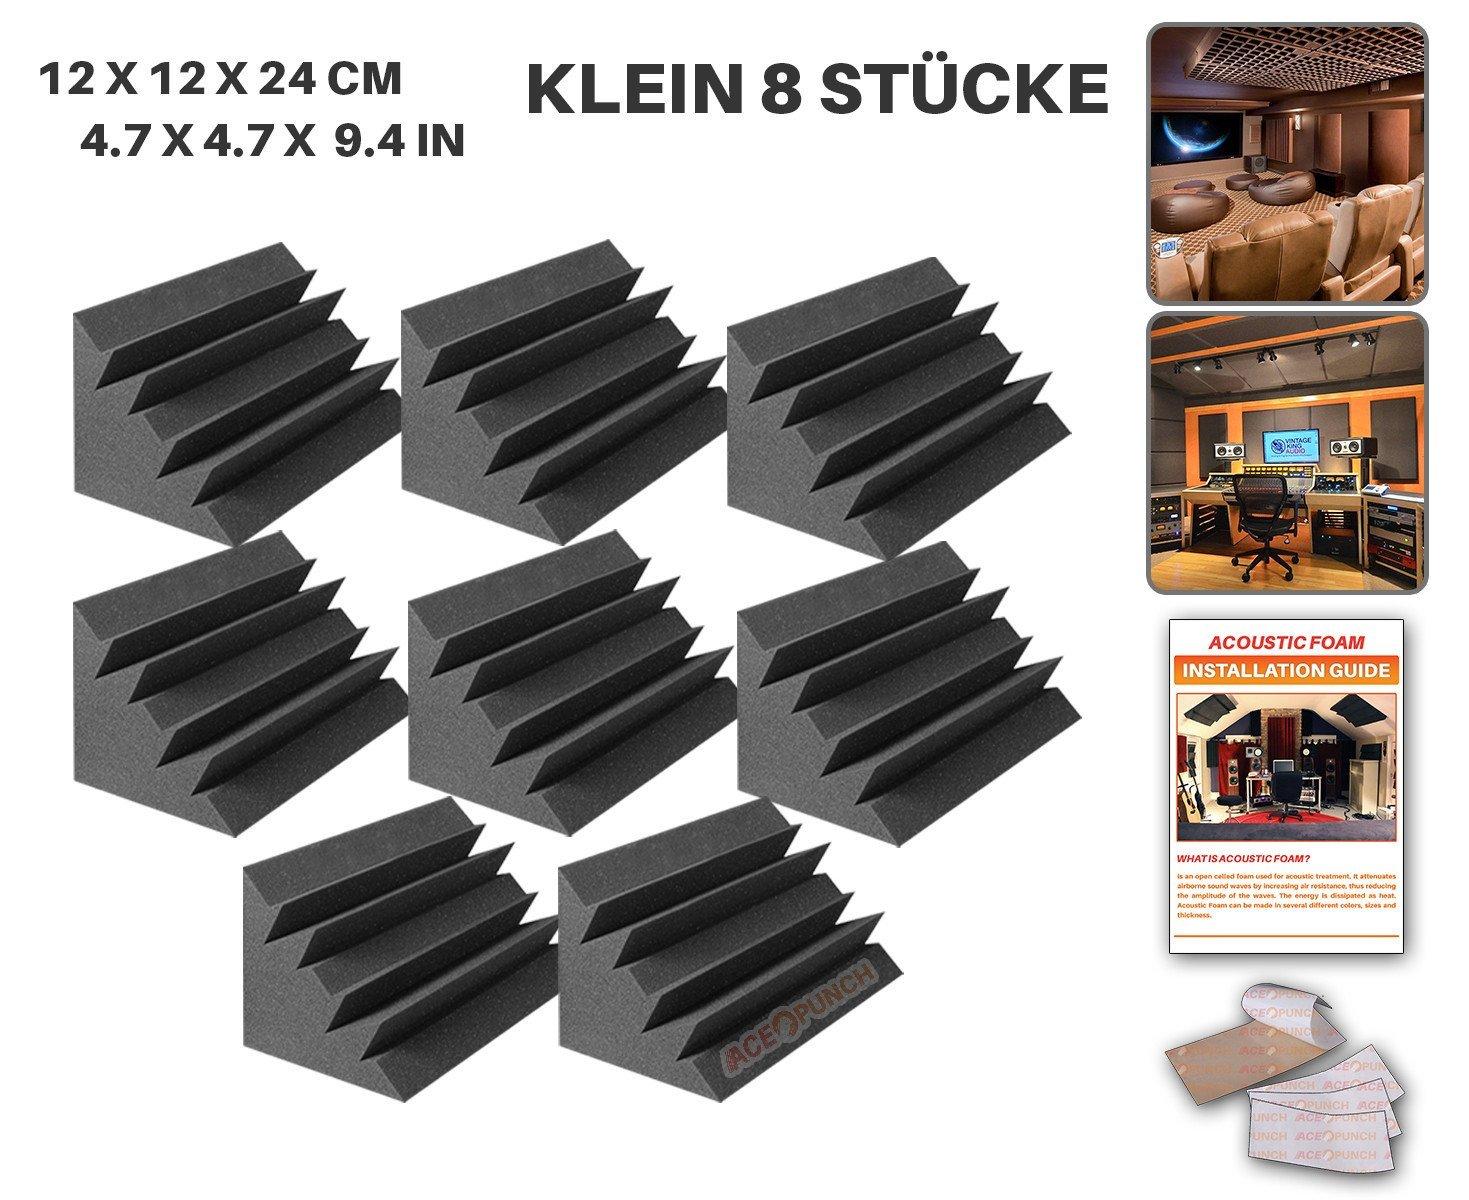 Ace Punch 8 Stücke Bass Trap Absorber Akustikschaumstoff DIY Entwurf Mit Freiem Klebestreifen 12 X 12 X 24 cm (4.7 X 4.7 X 9.4 in) AP1133